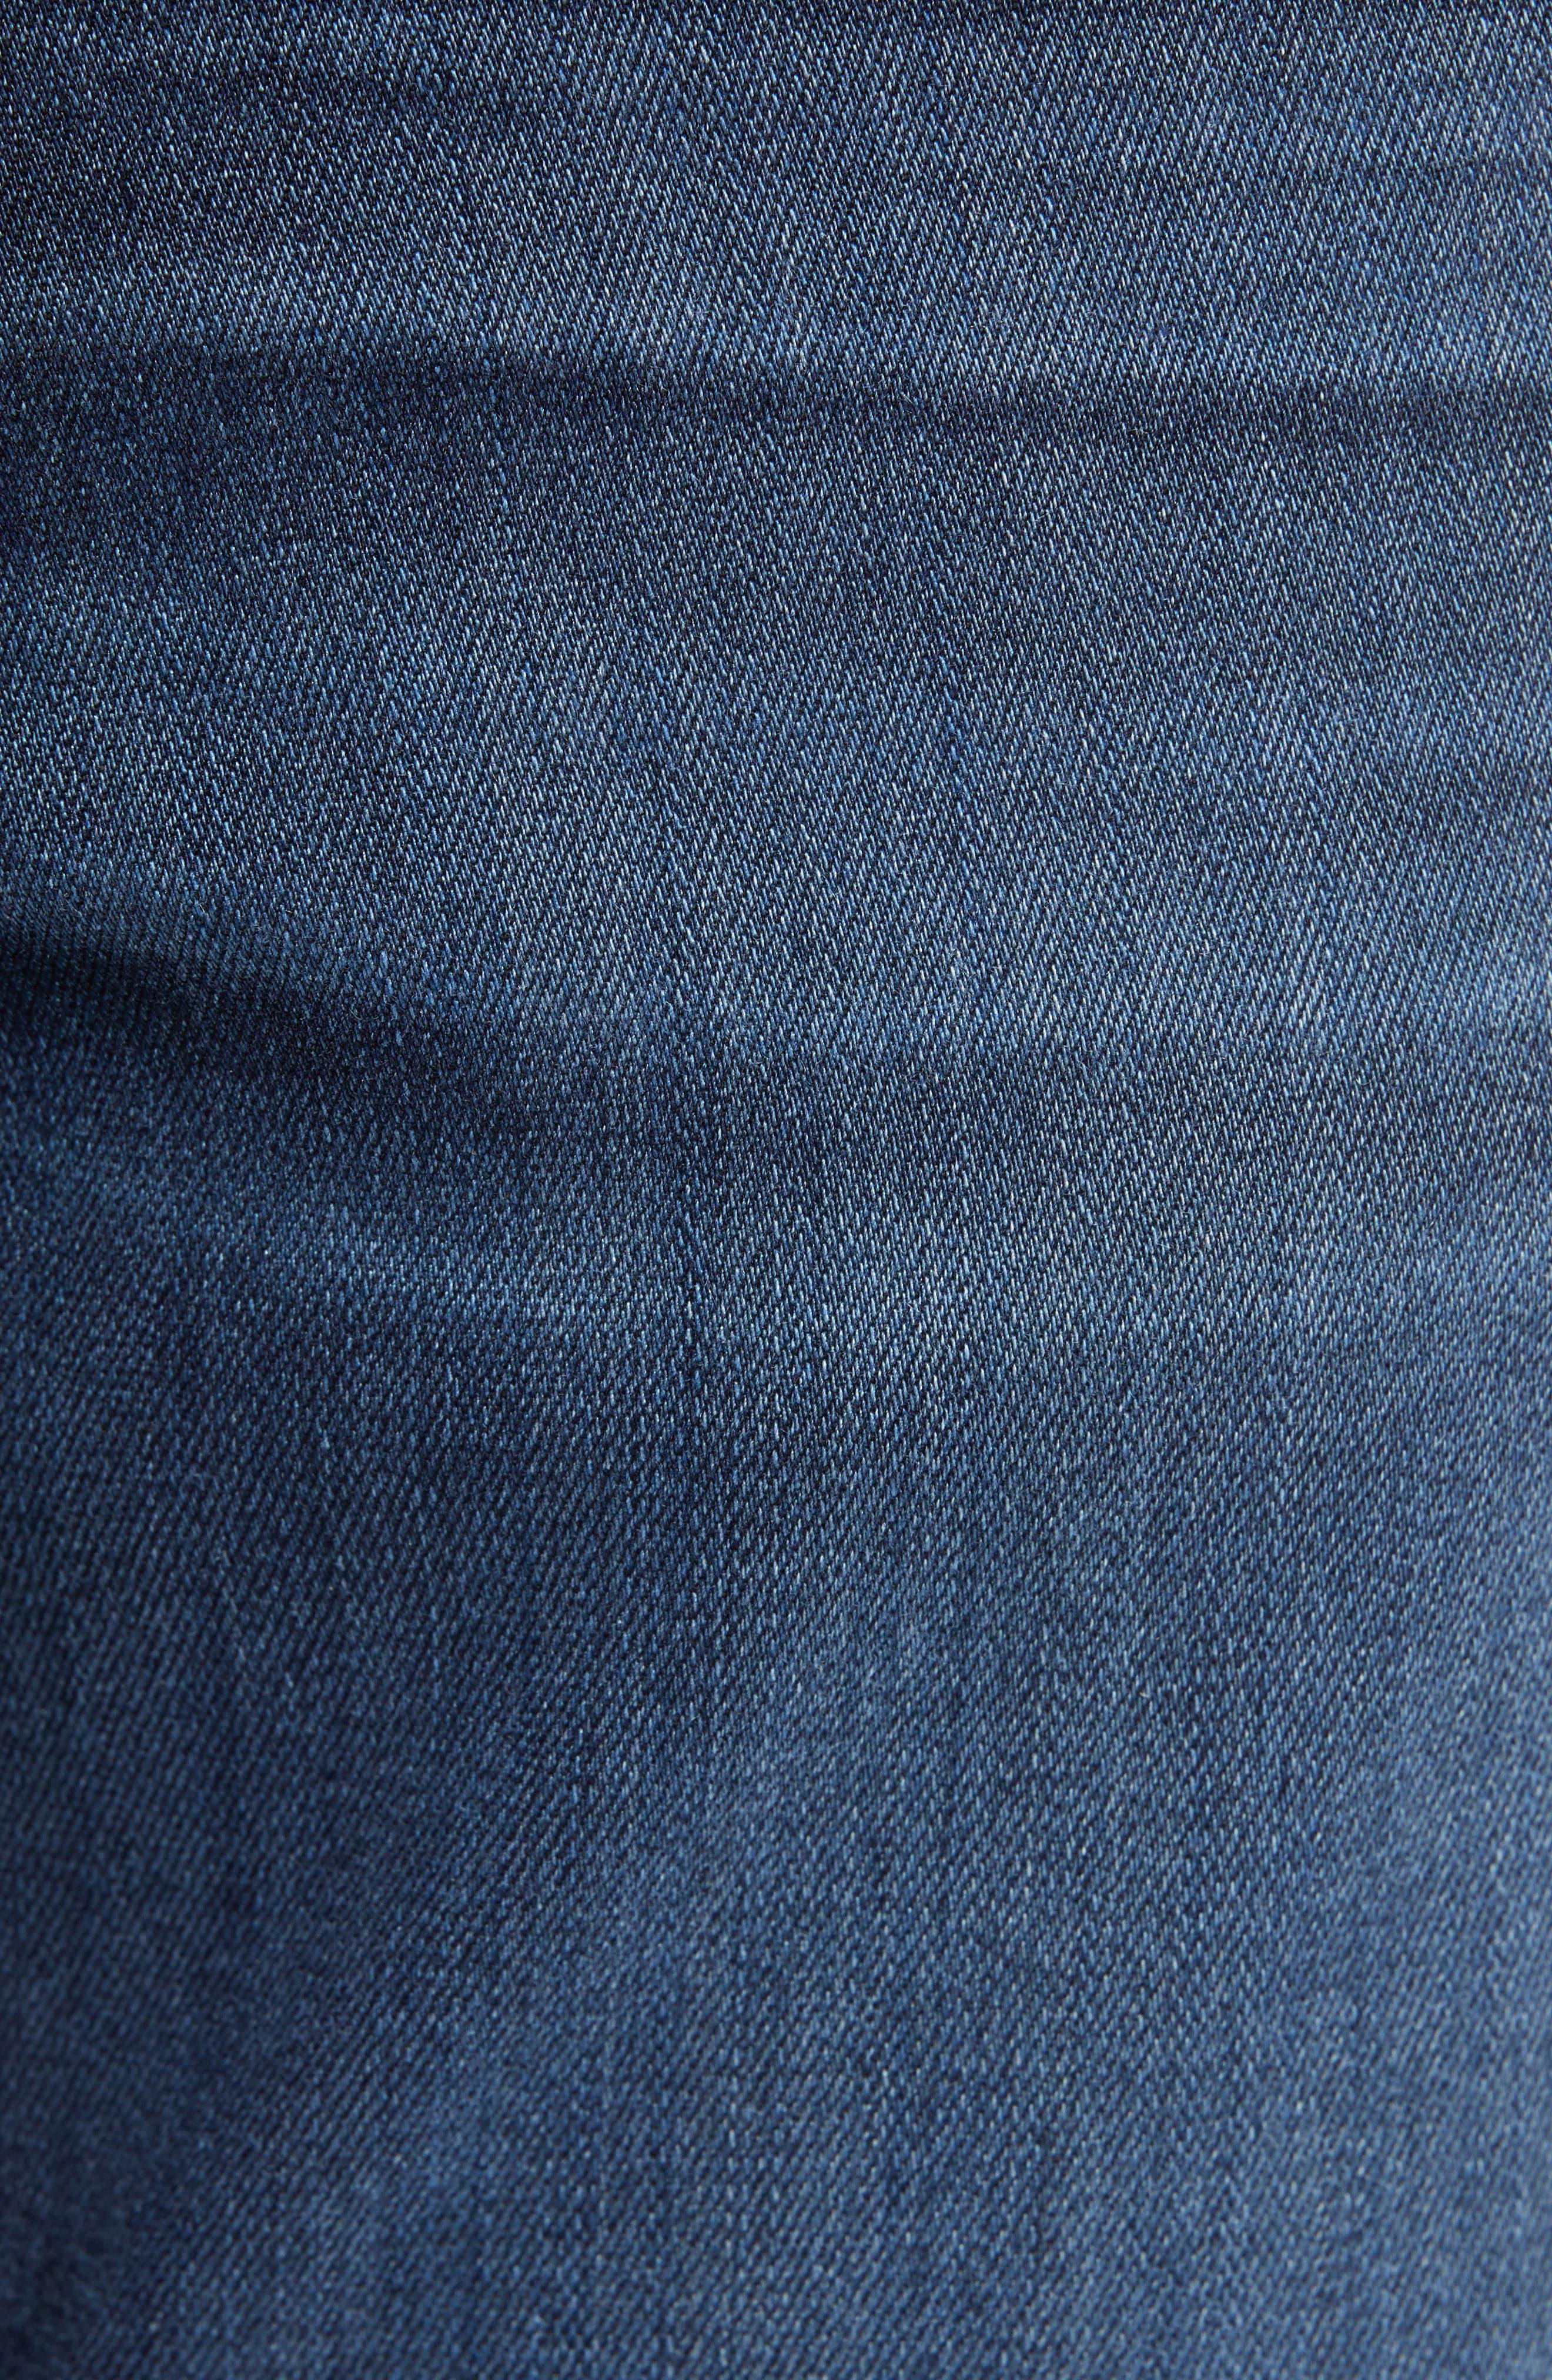 Transcend - Croft Skinny Fit Jeans,                             Alternate thumbnail 5, color,                             HUXLEY